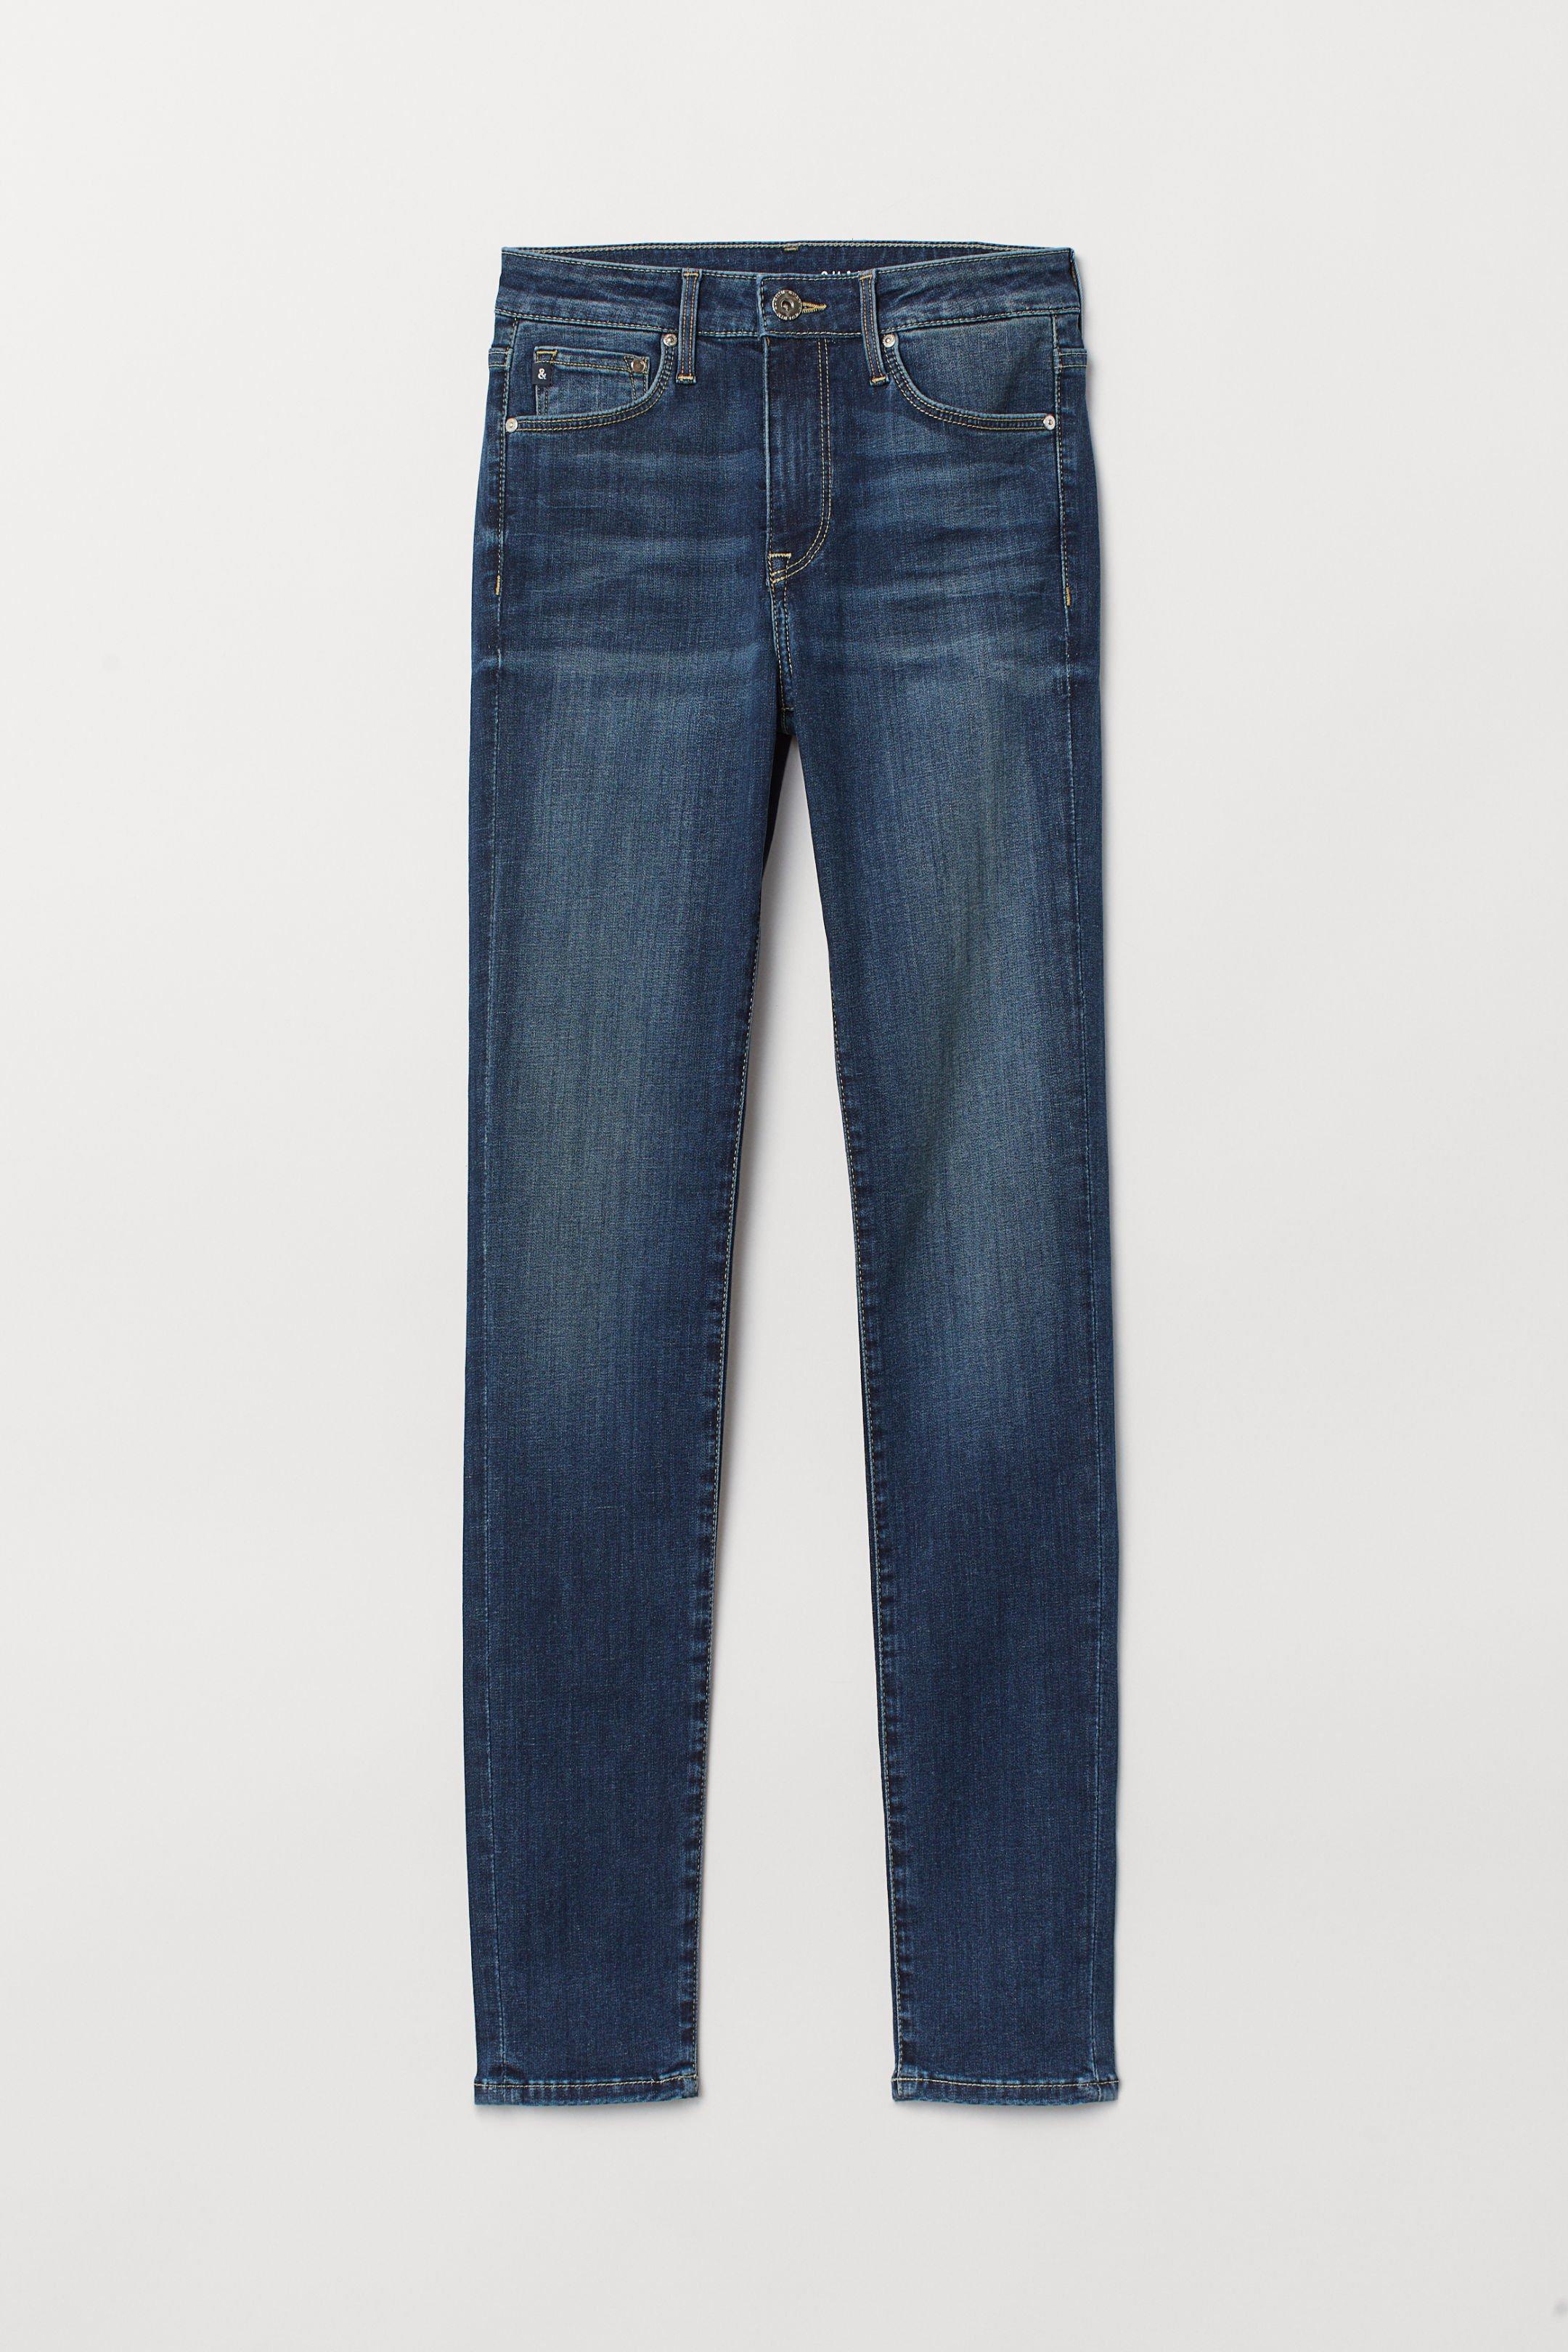 Shaping Skinny Regular Jeans - Dark denim blue - Ladies | H&M US